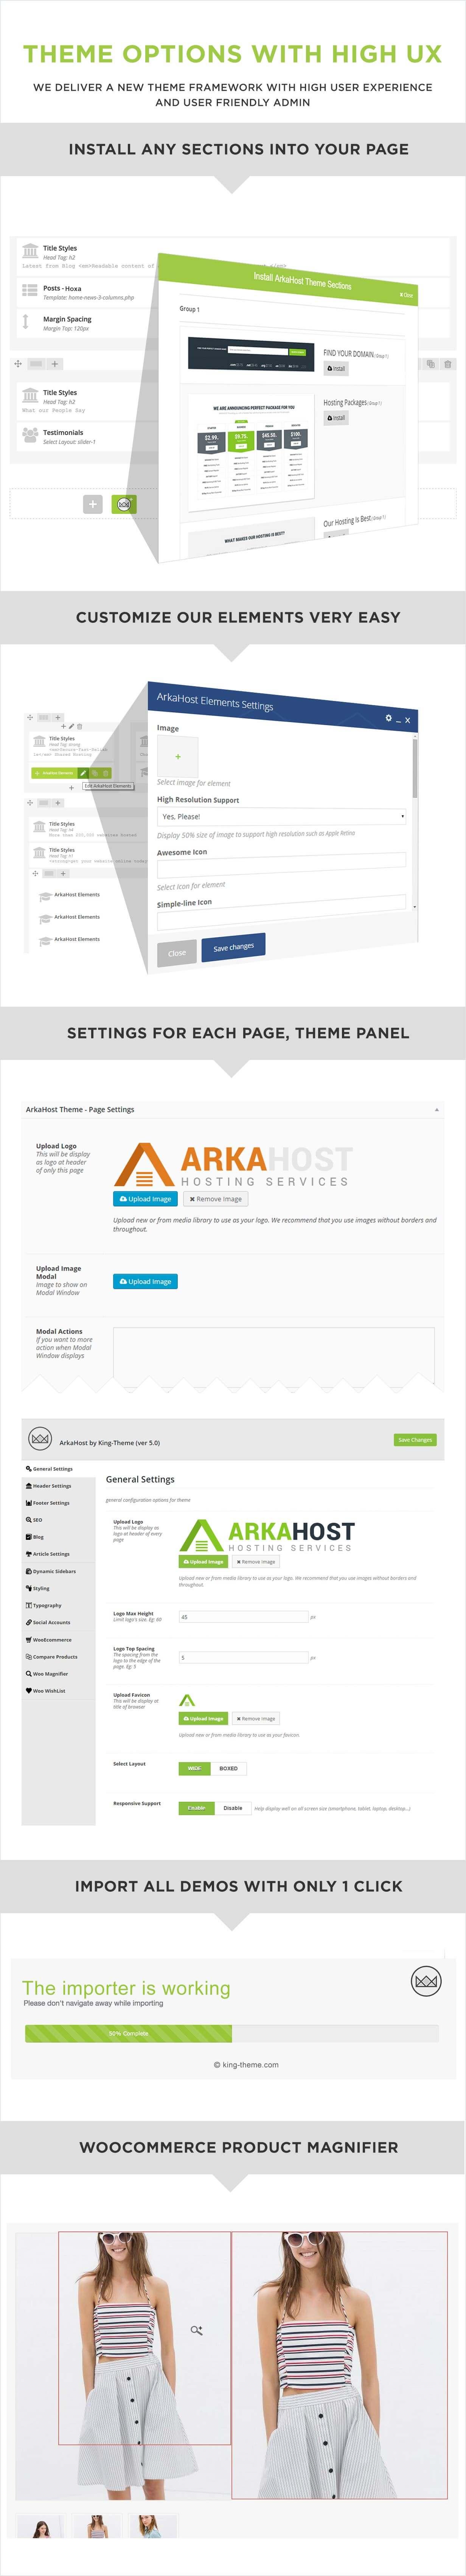 وصف موضوع استضافة ArkaHost وورد 7